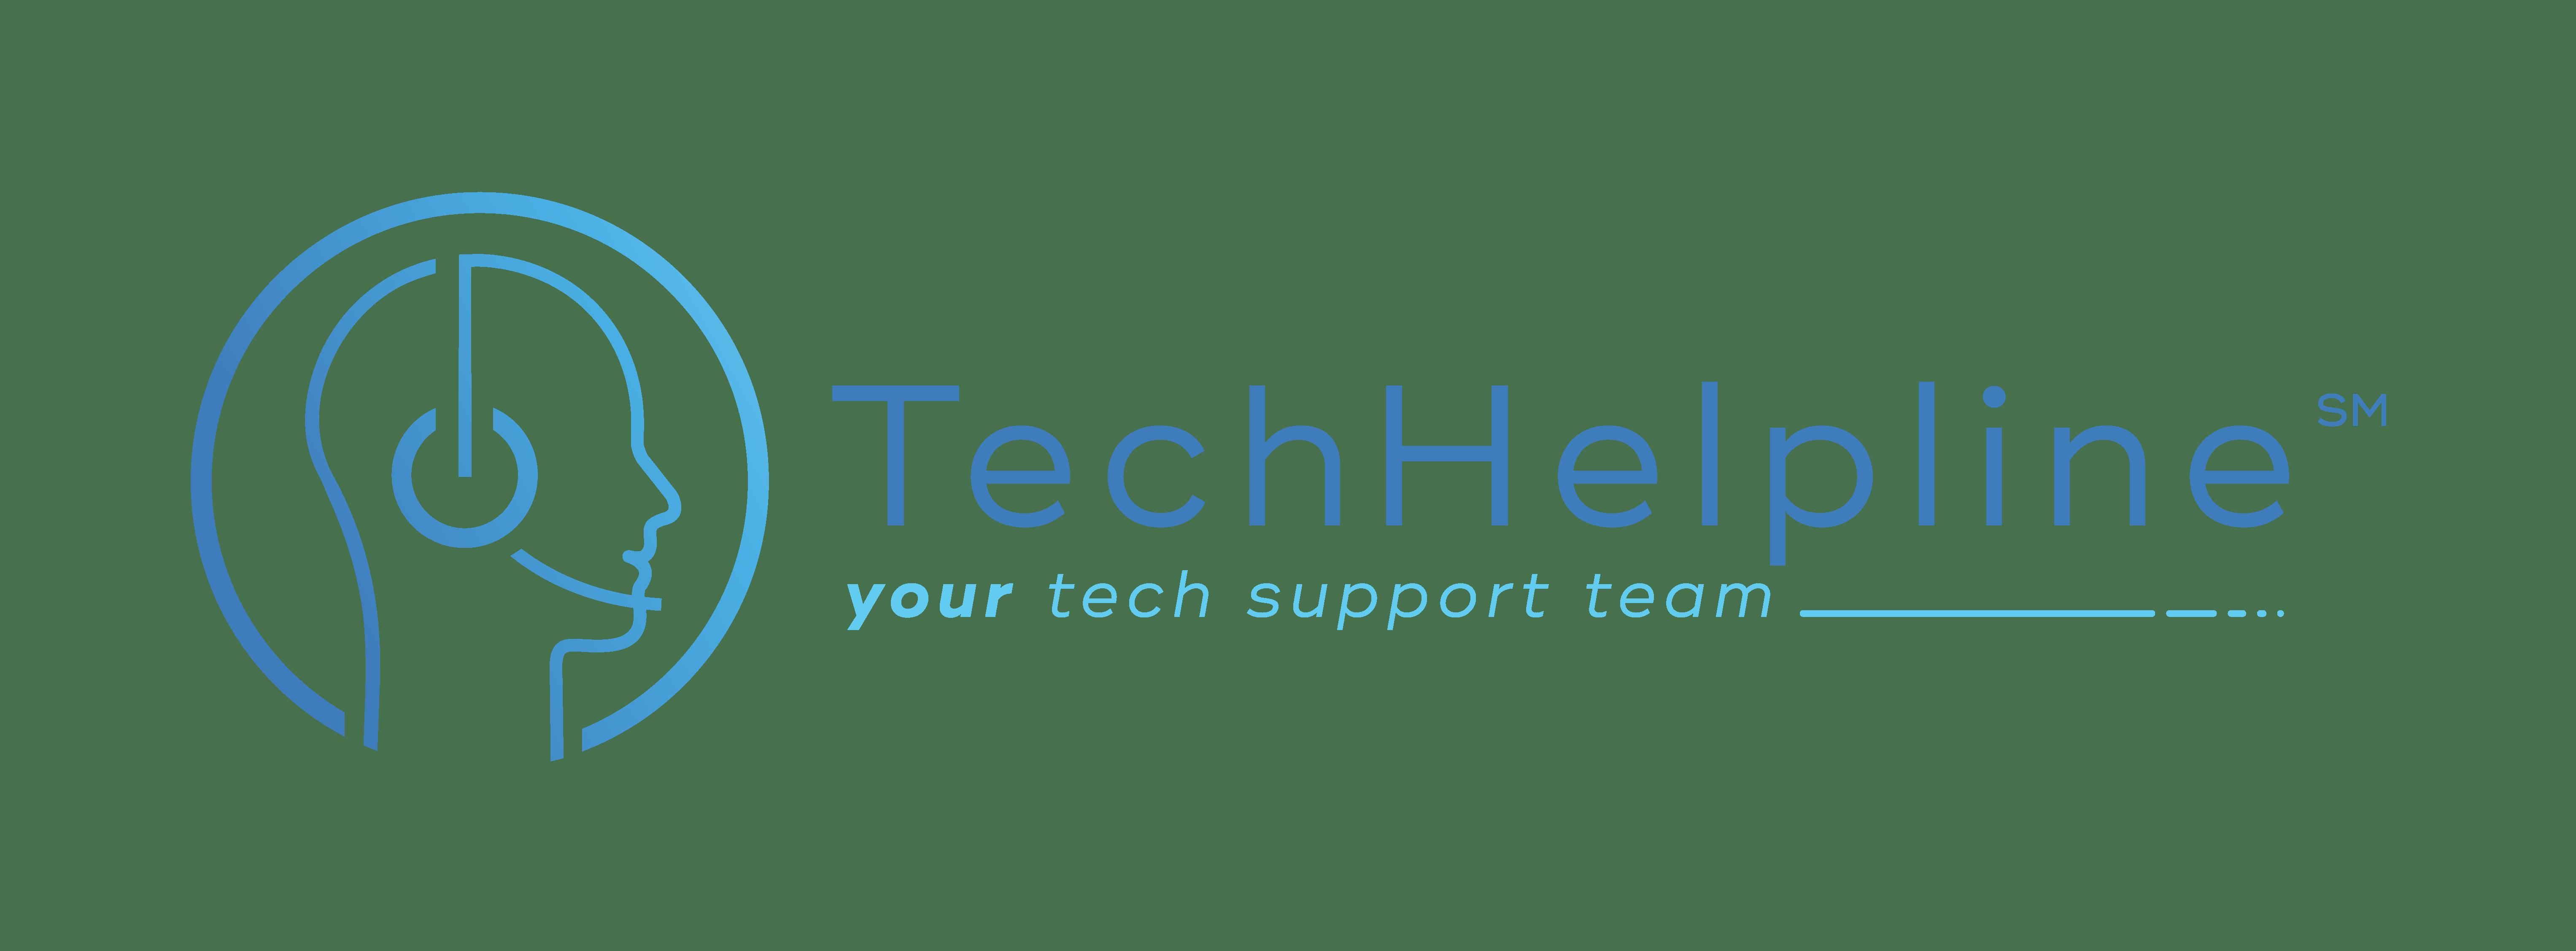 Tech-Helpline-logo-H-